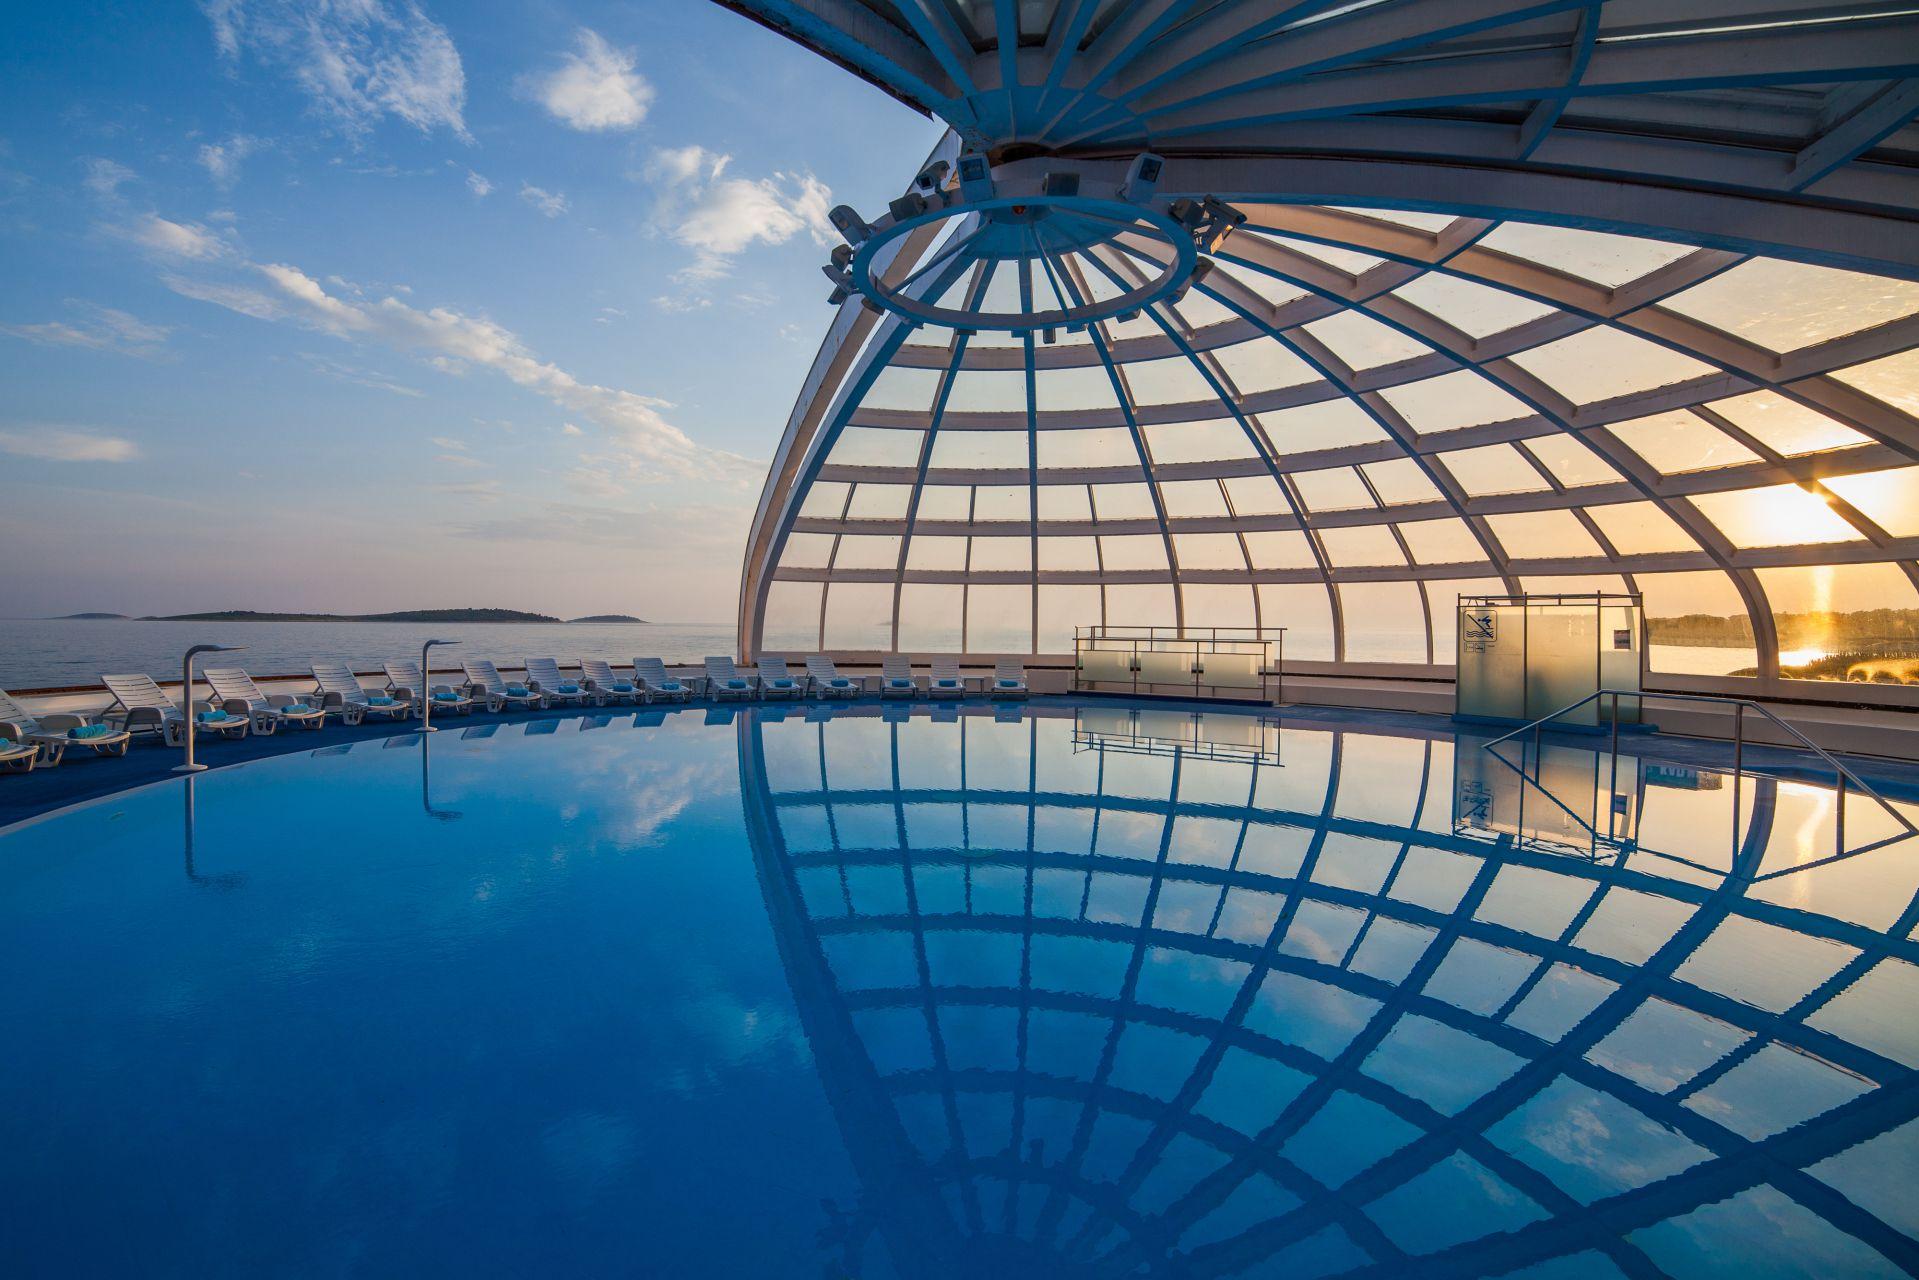 swimming pool 02 14845717123 o - Zora Hotel